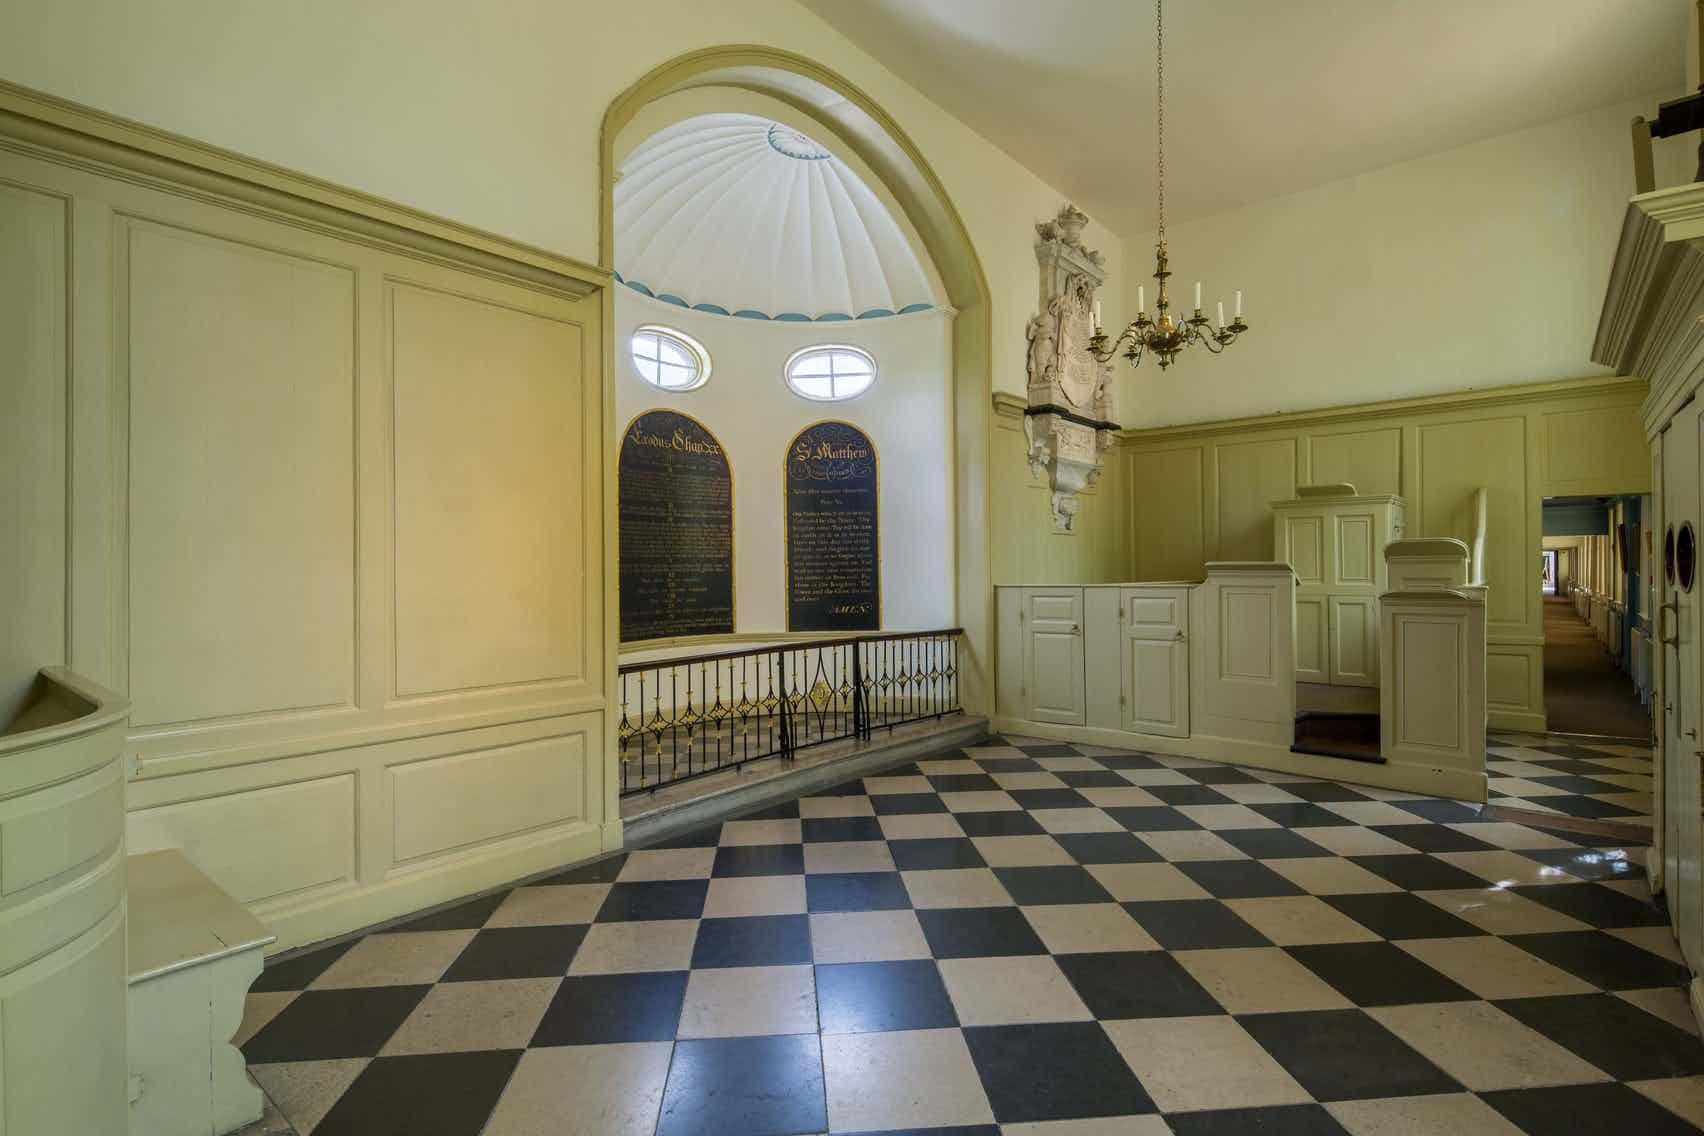 Chapel & Reading Rooms, Geffrye Museum